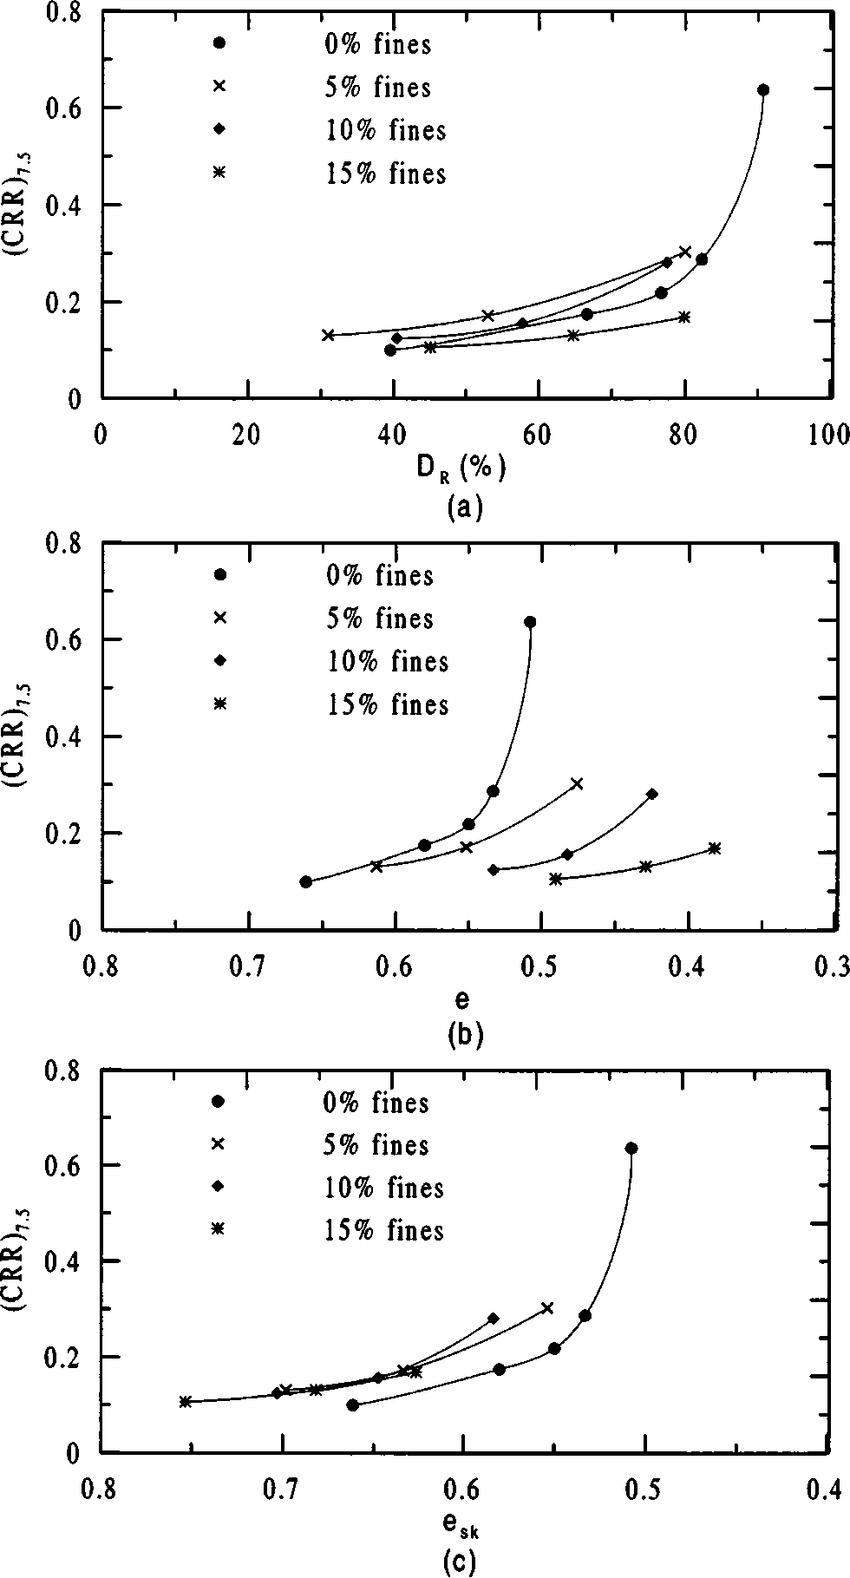 medium resolution of cyclic resistance ratio crr 7 5 versus a relative density d r b download scientific diagram